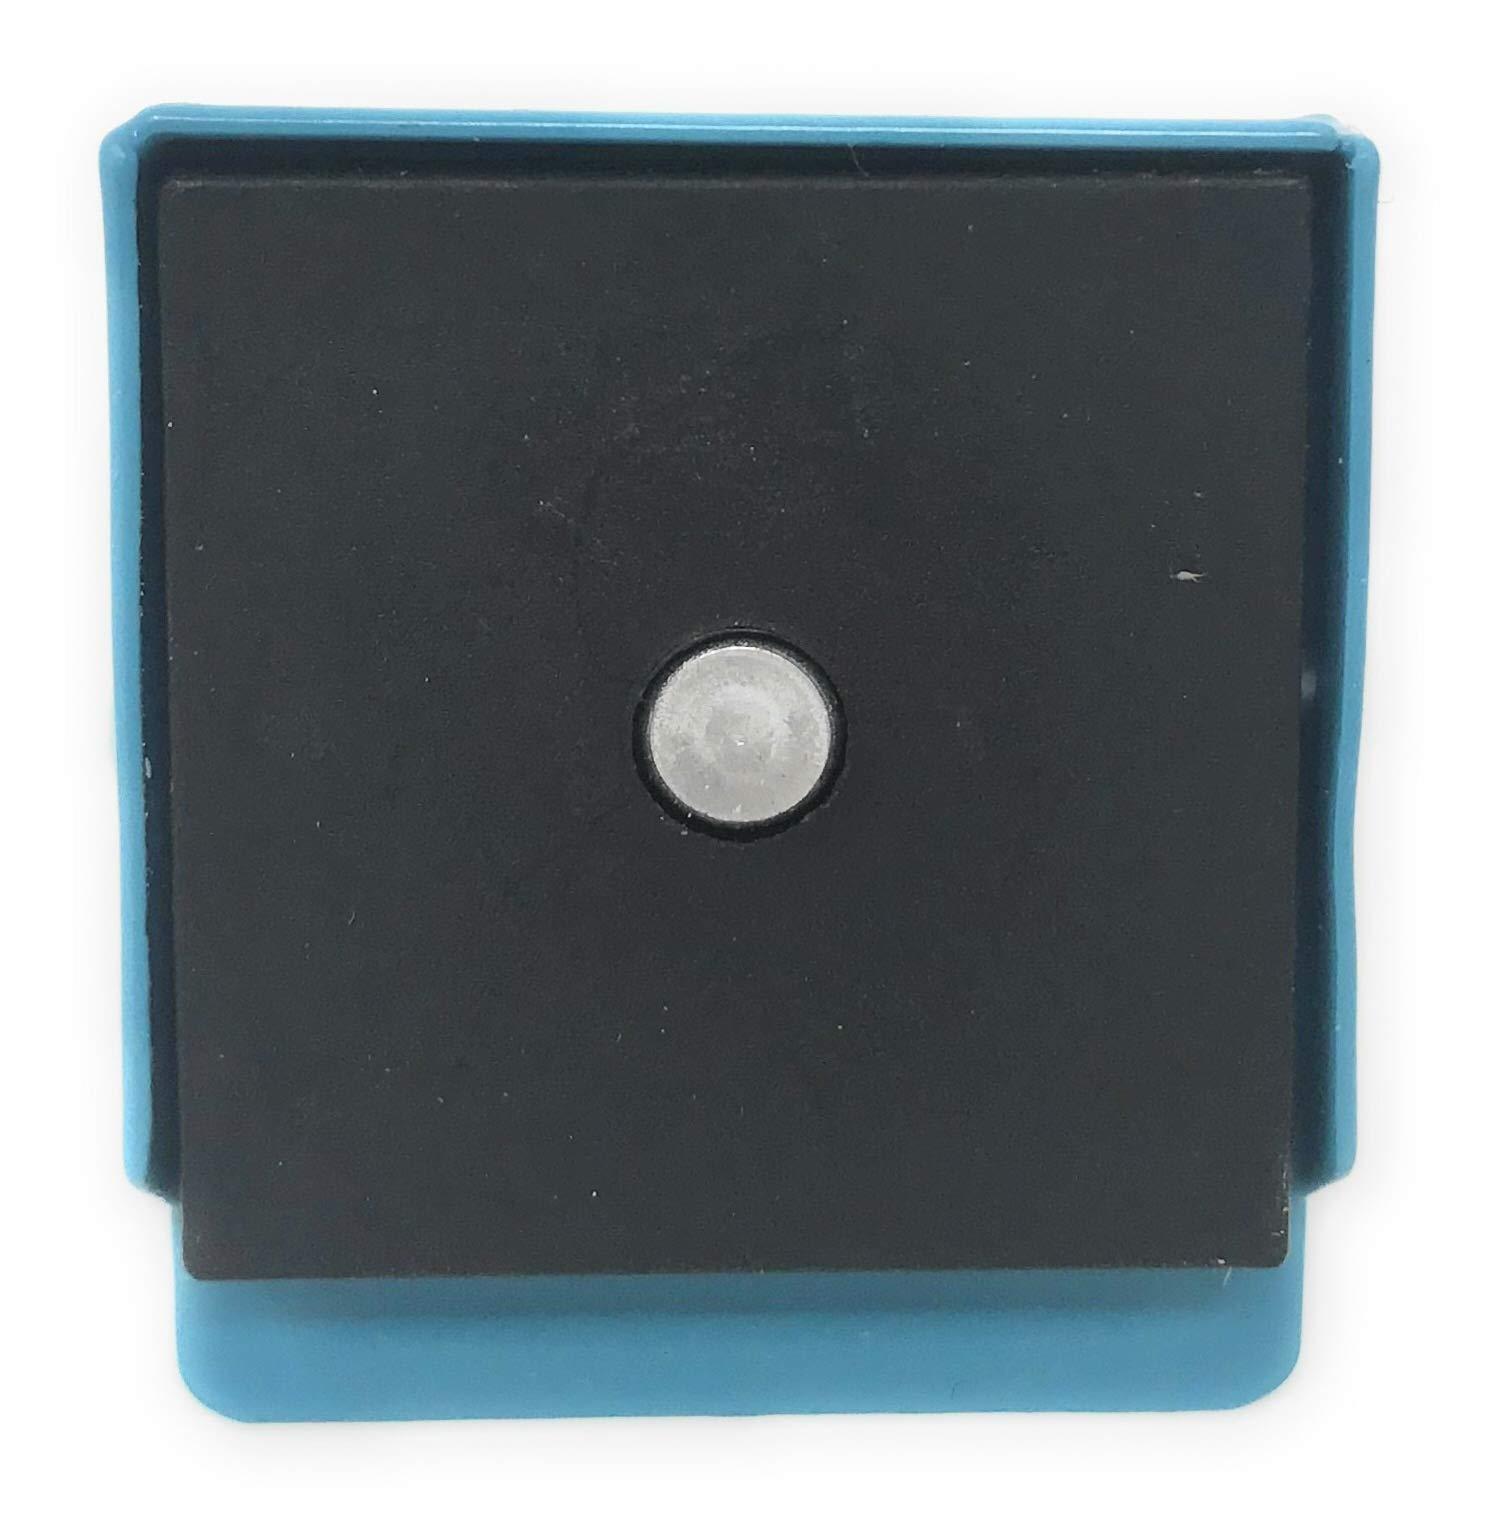 Bundle of Listo 1620 Marking Pencil/Grease Pencils/China Marking Pencils/Wax Pencils - Black, Box of 12 With 72 Refills With Bonus Magnetic Memo Clip by Listo (Image #5)